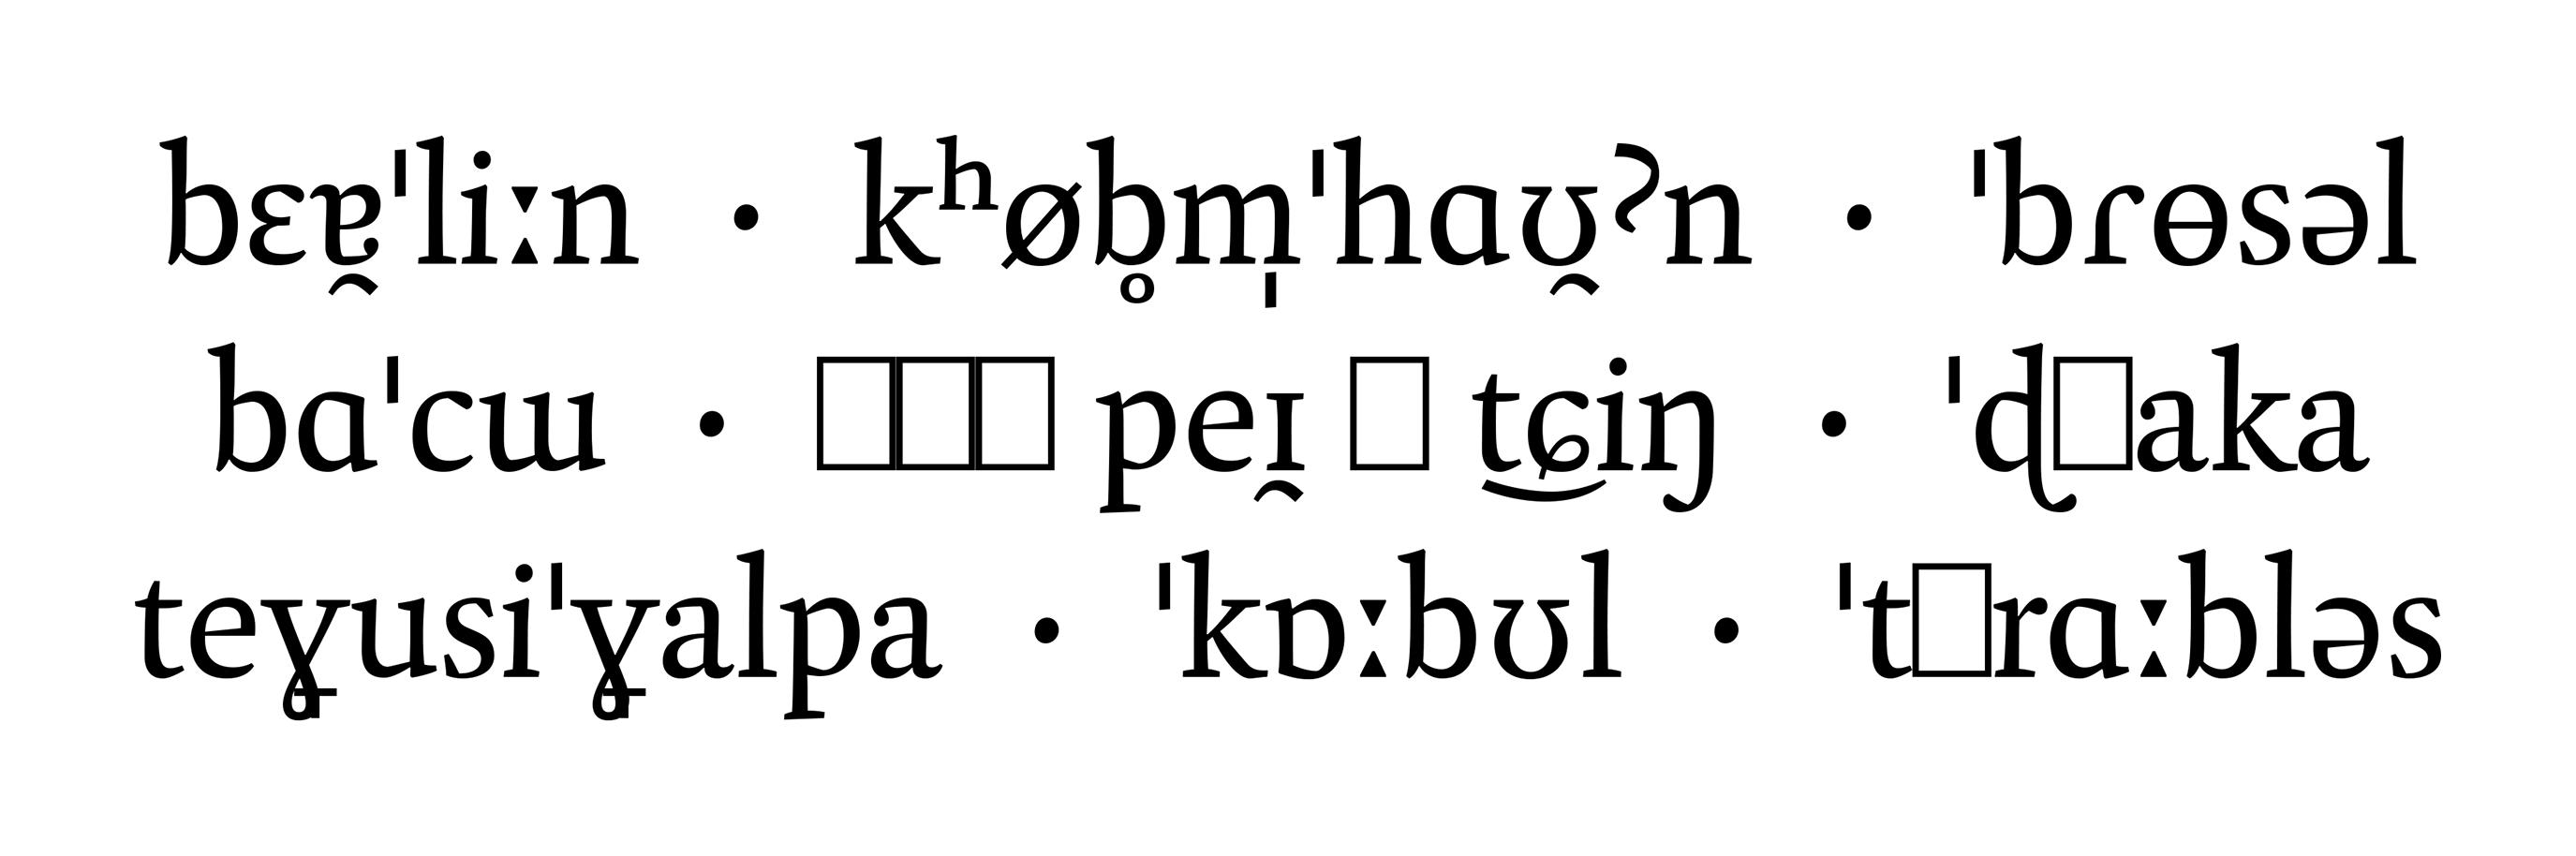 IPA-Schriftmuster der Huronia